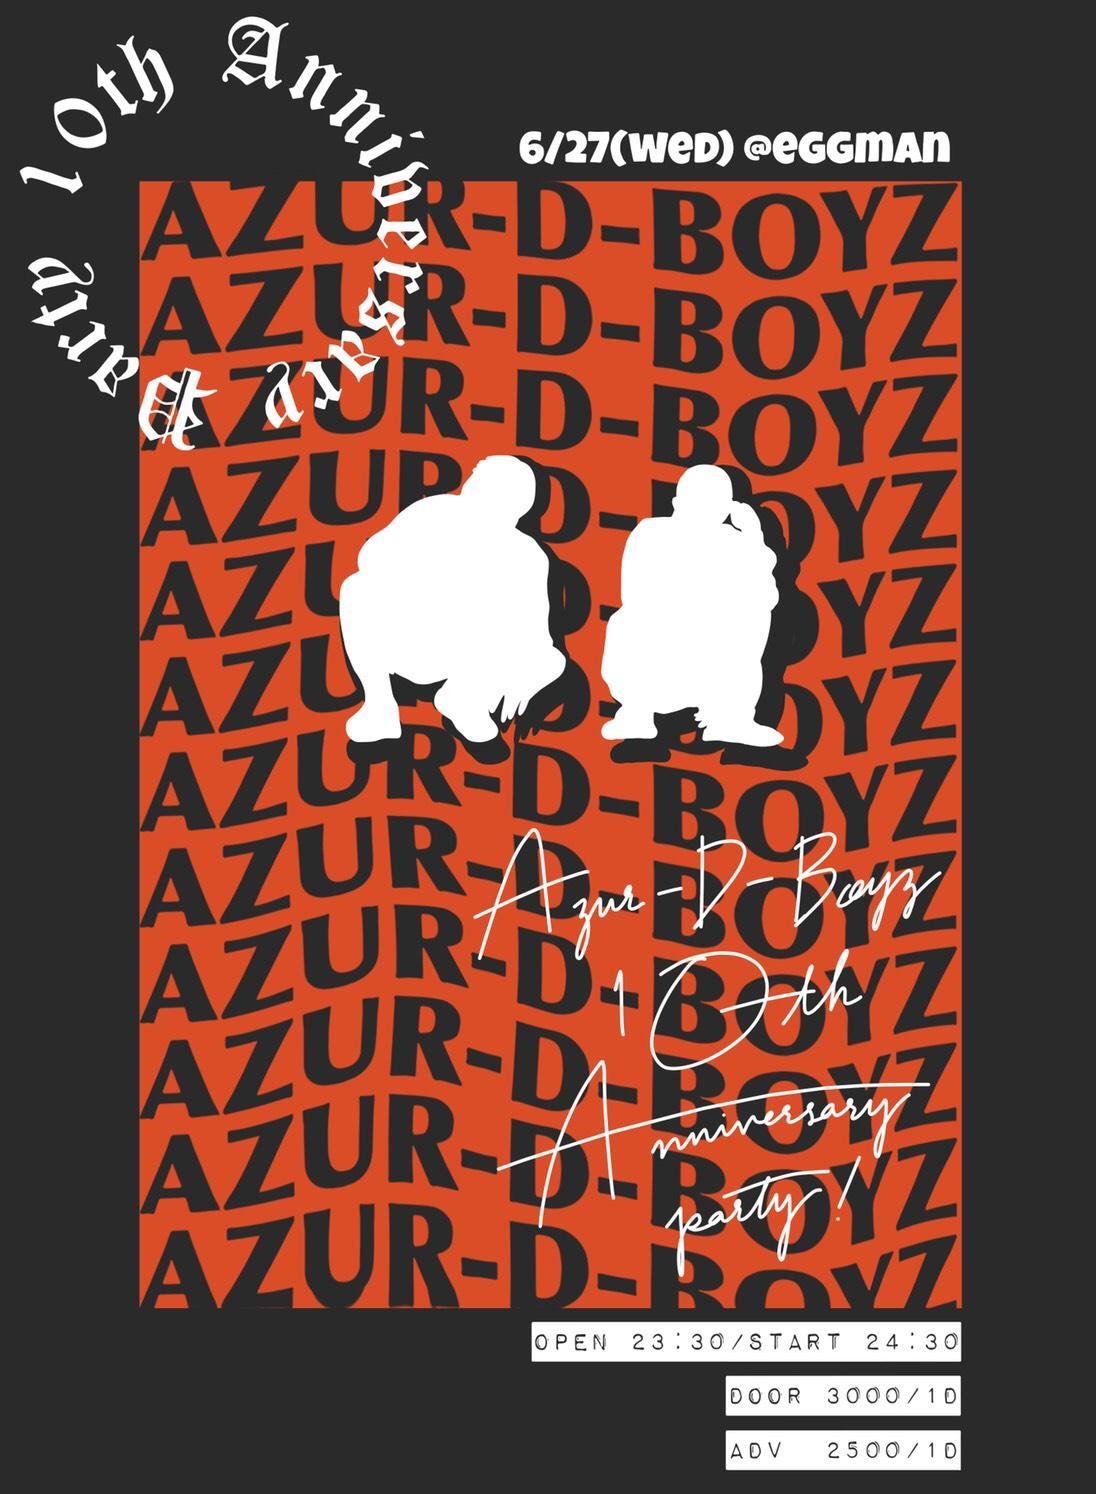 AZUR-D-BOYZ 10th Anniversary Party